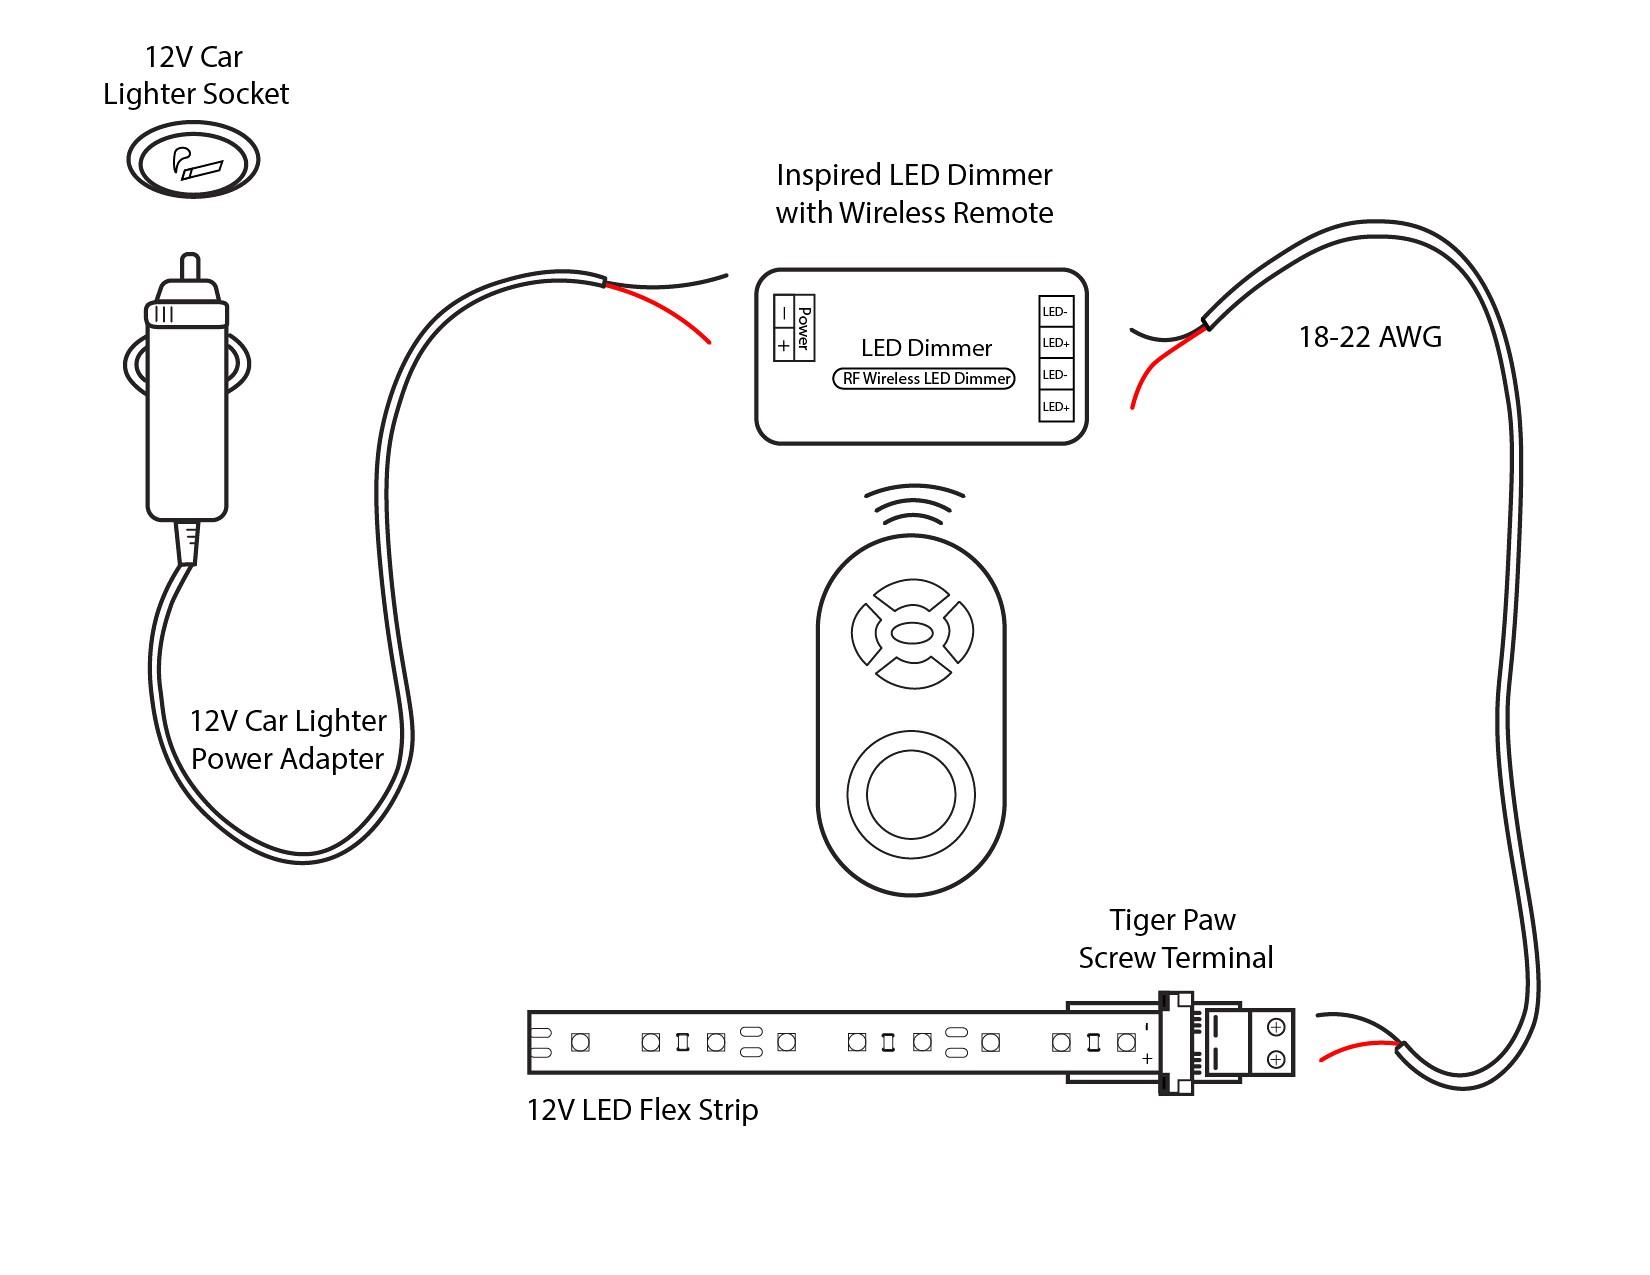 hight resolution of 12v plug wiring diagram go wiring diagram 12v motor wiring diagram 12v accessory wiring diagram led indicator light